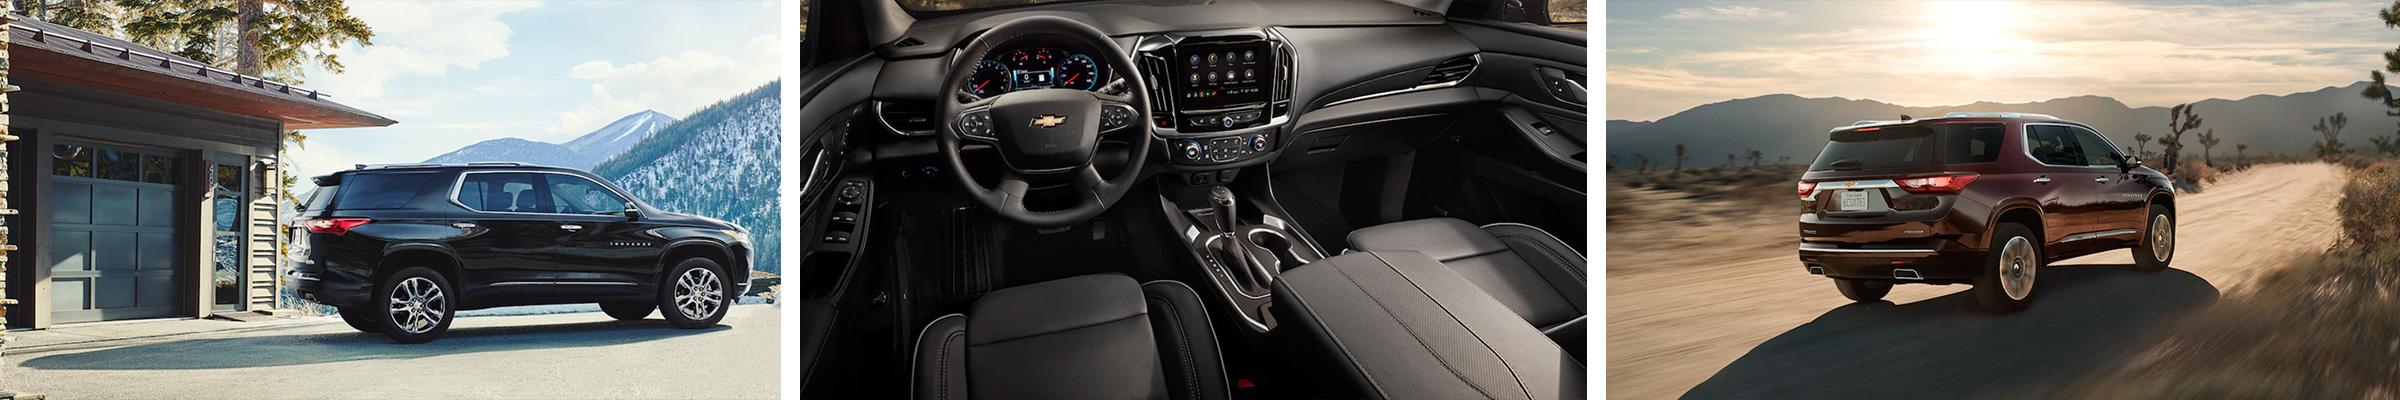 2021 Chevrolet Traverse For Sale Lake Park FL | Palm Beach Gardens